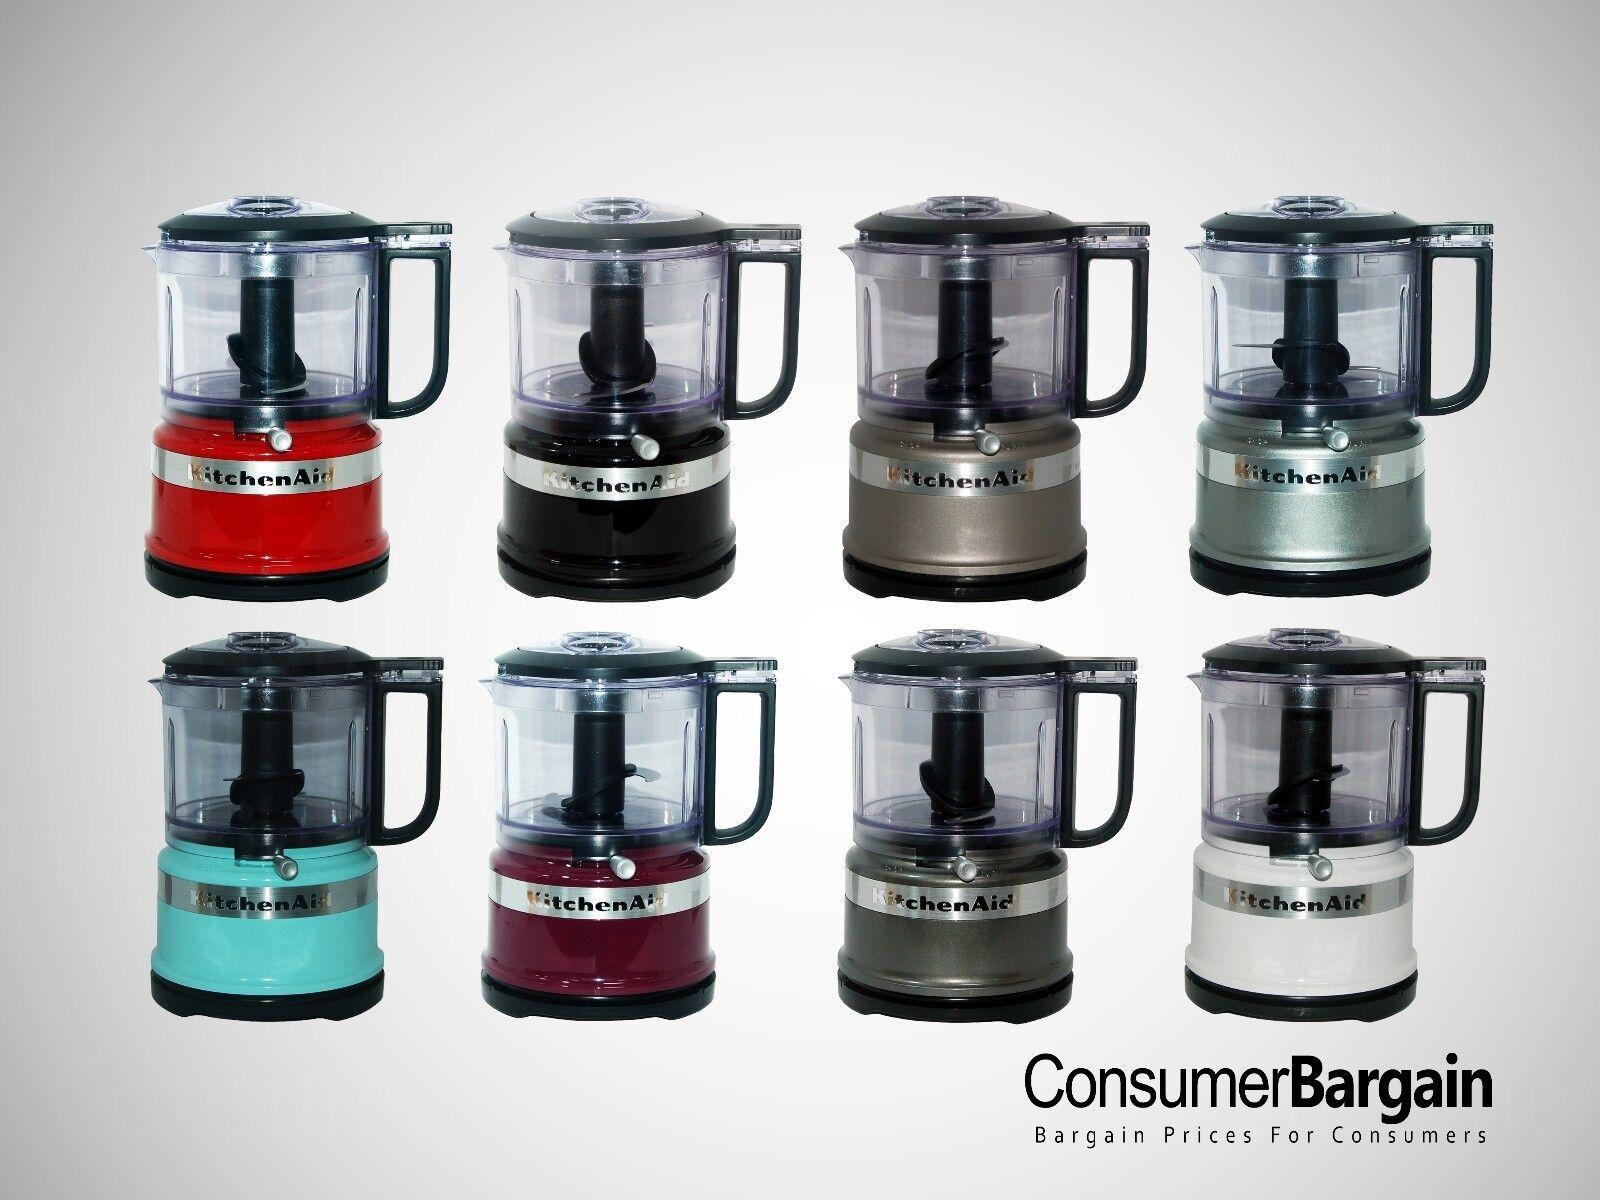 Details about KitchenAid KFC3516 3.5 Cup Mini Food Processor Guaranteed  Refurbished BPA-Free!!